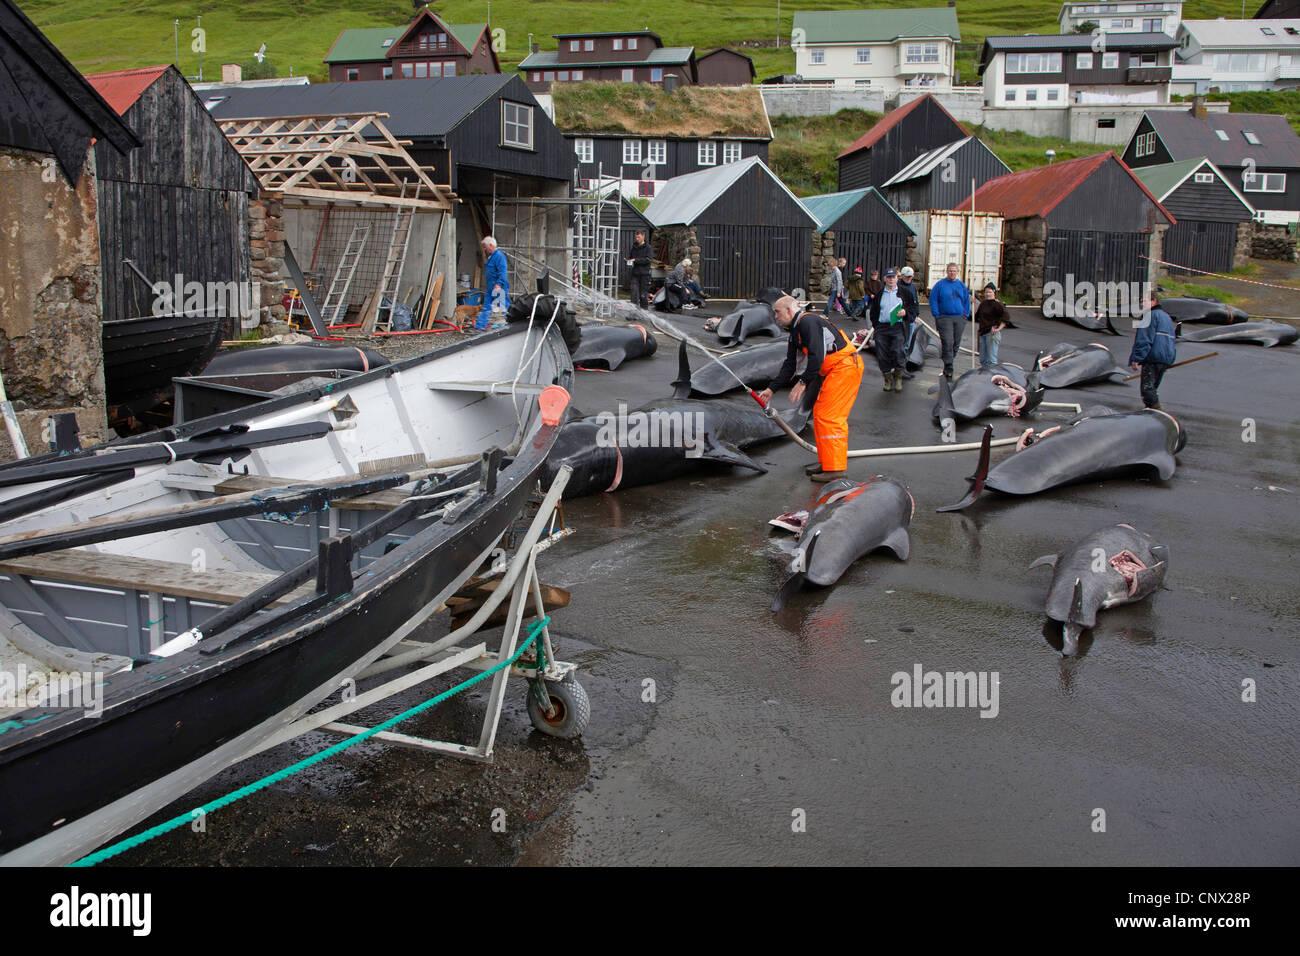 weißen Pilotwal, Kiffer Wal, Caaing Wal, Longfin Pilotwal, Atlantic Pilotwal, Blackfish (Globicephala Melas, Stockbild